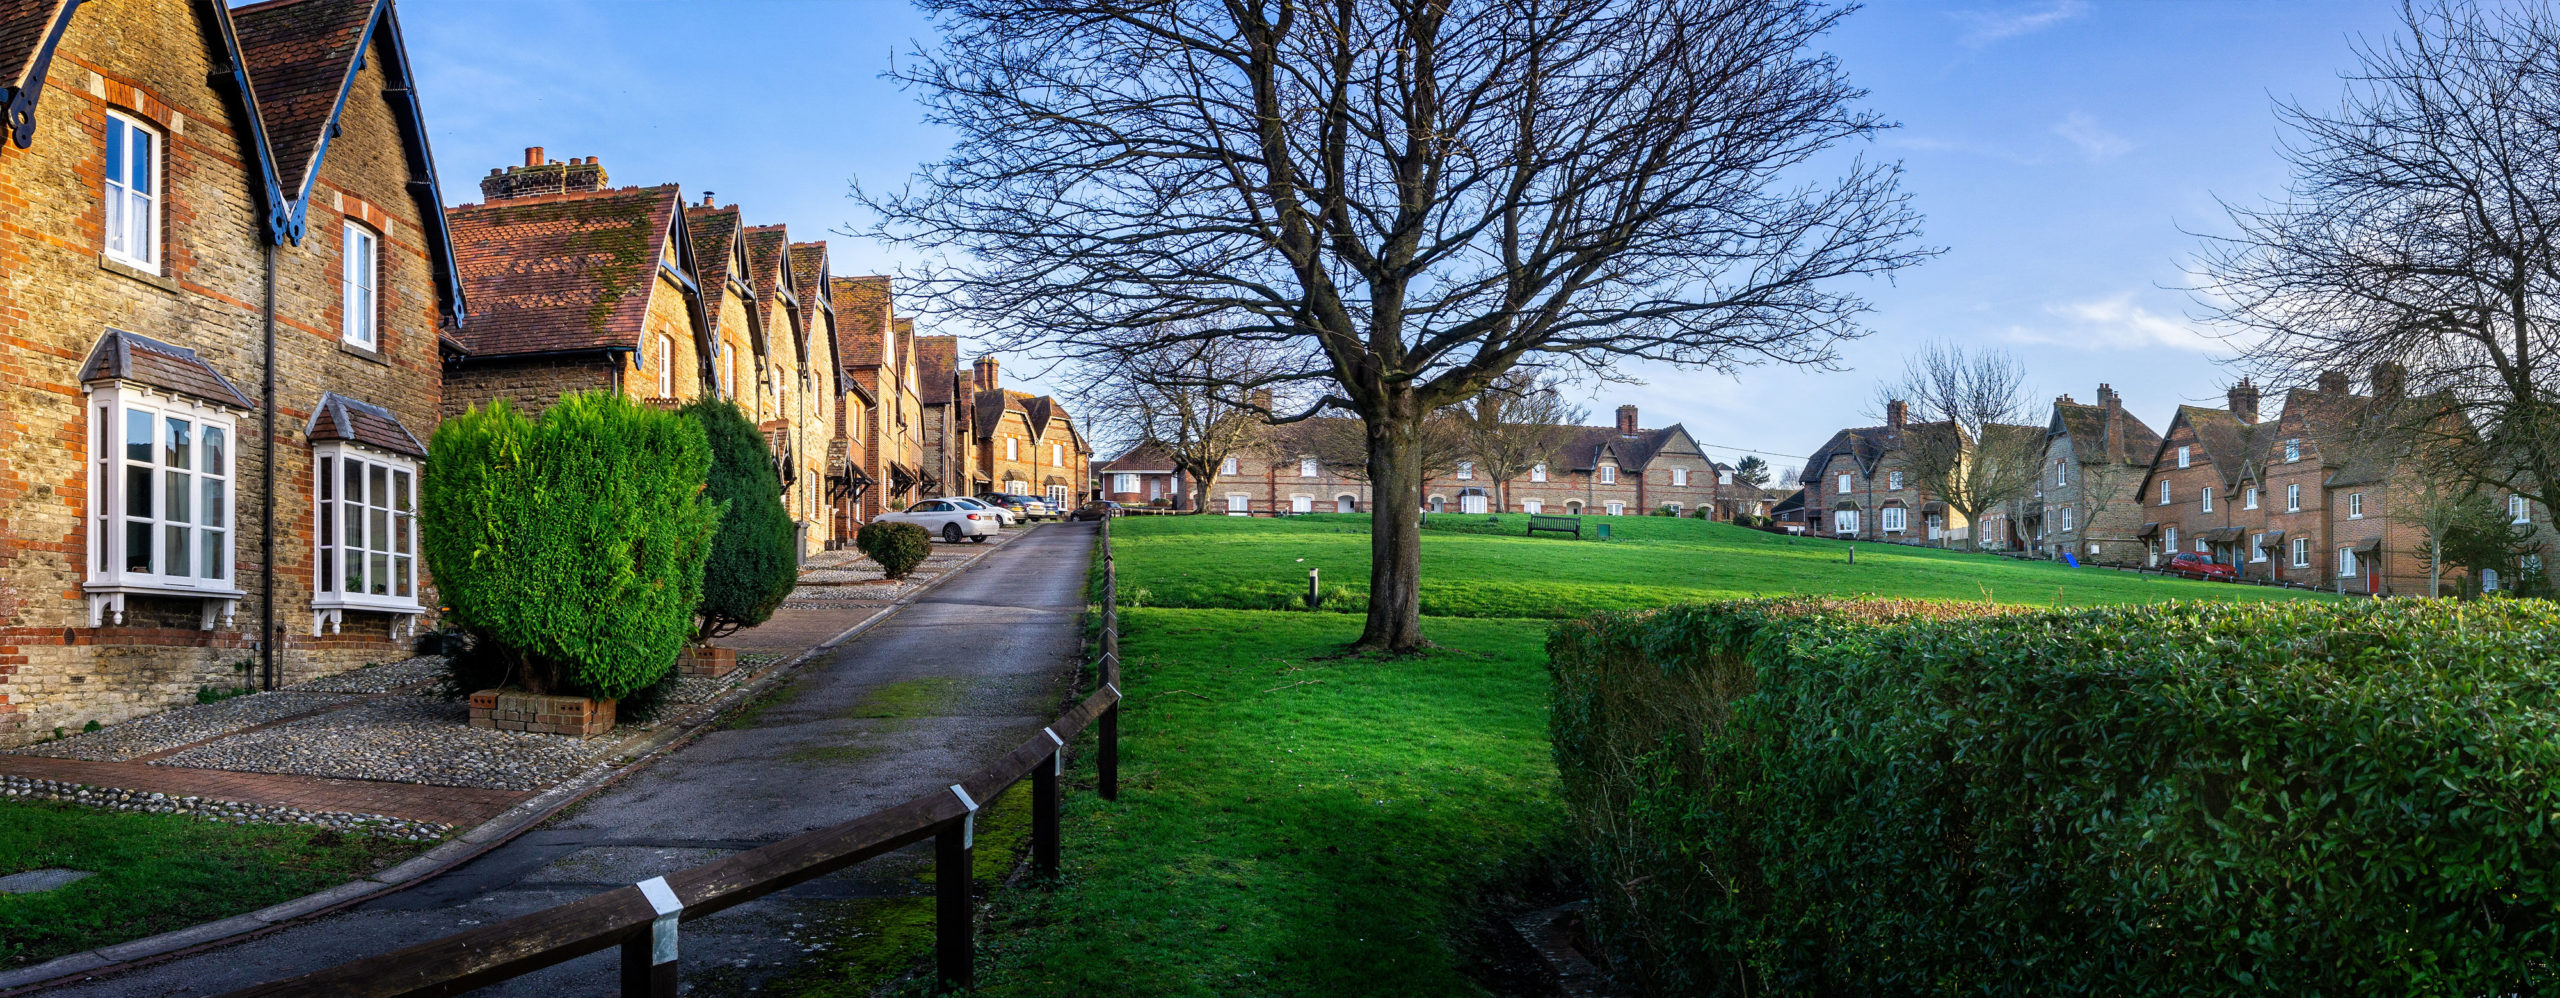 Wiltshire Village Green